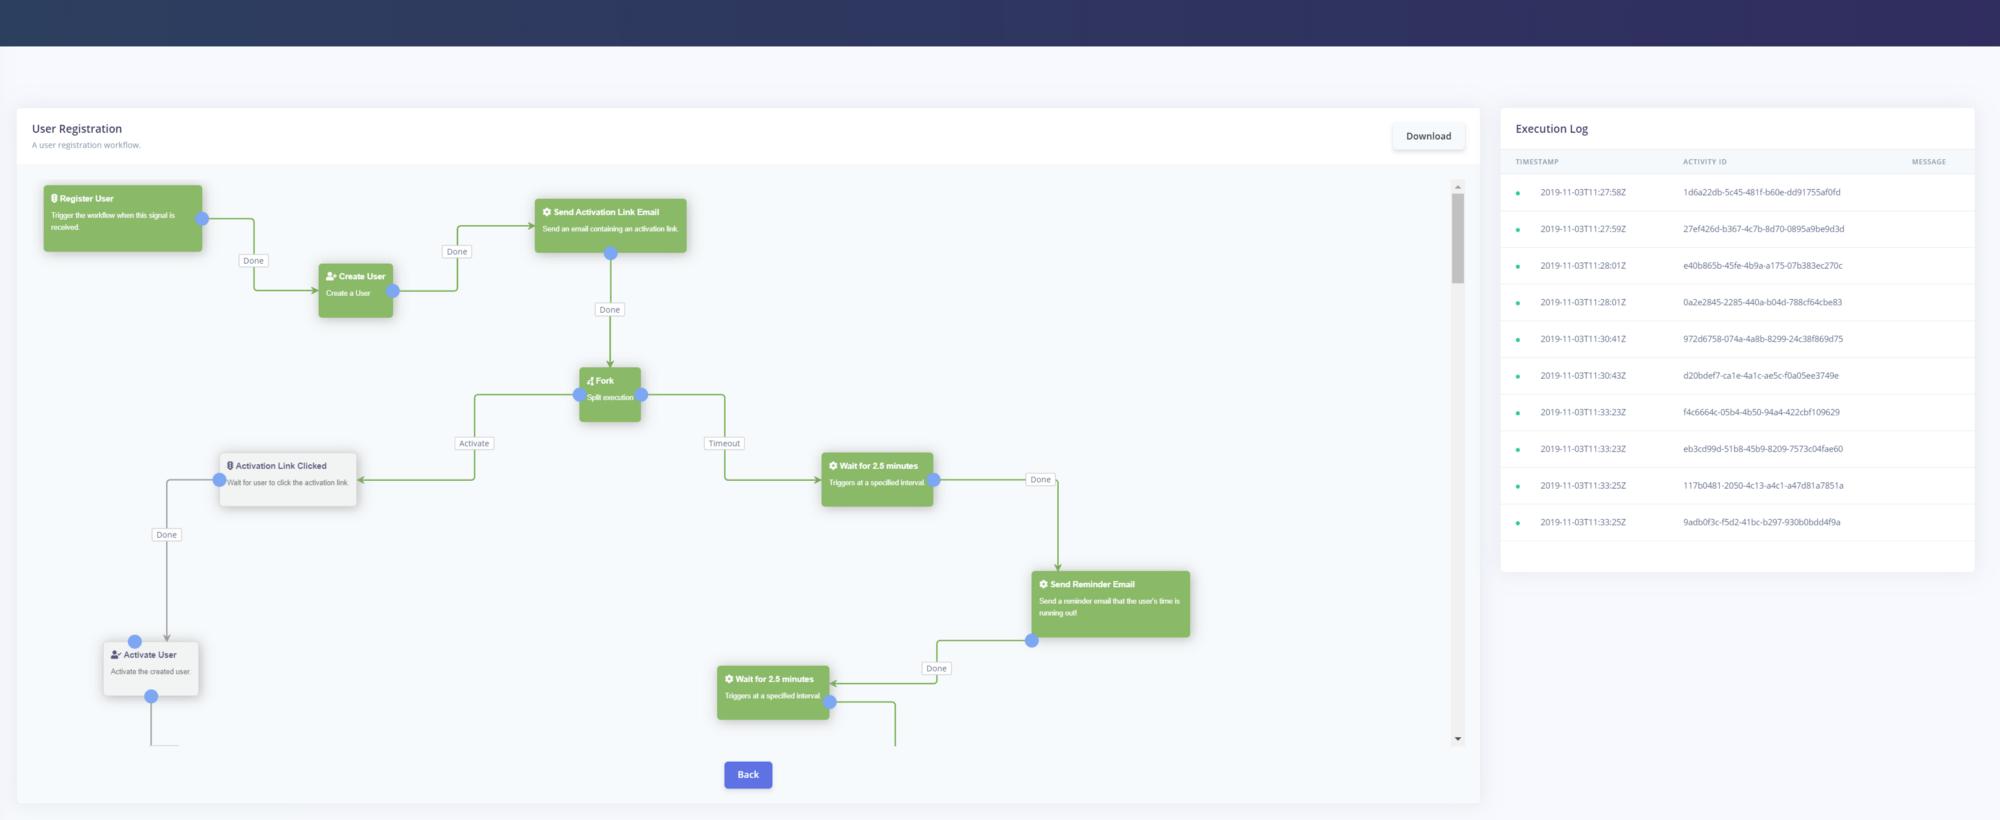 Workflow Execution Path